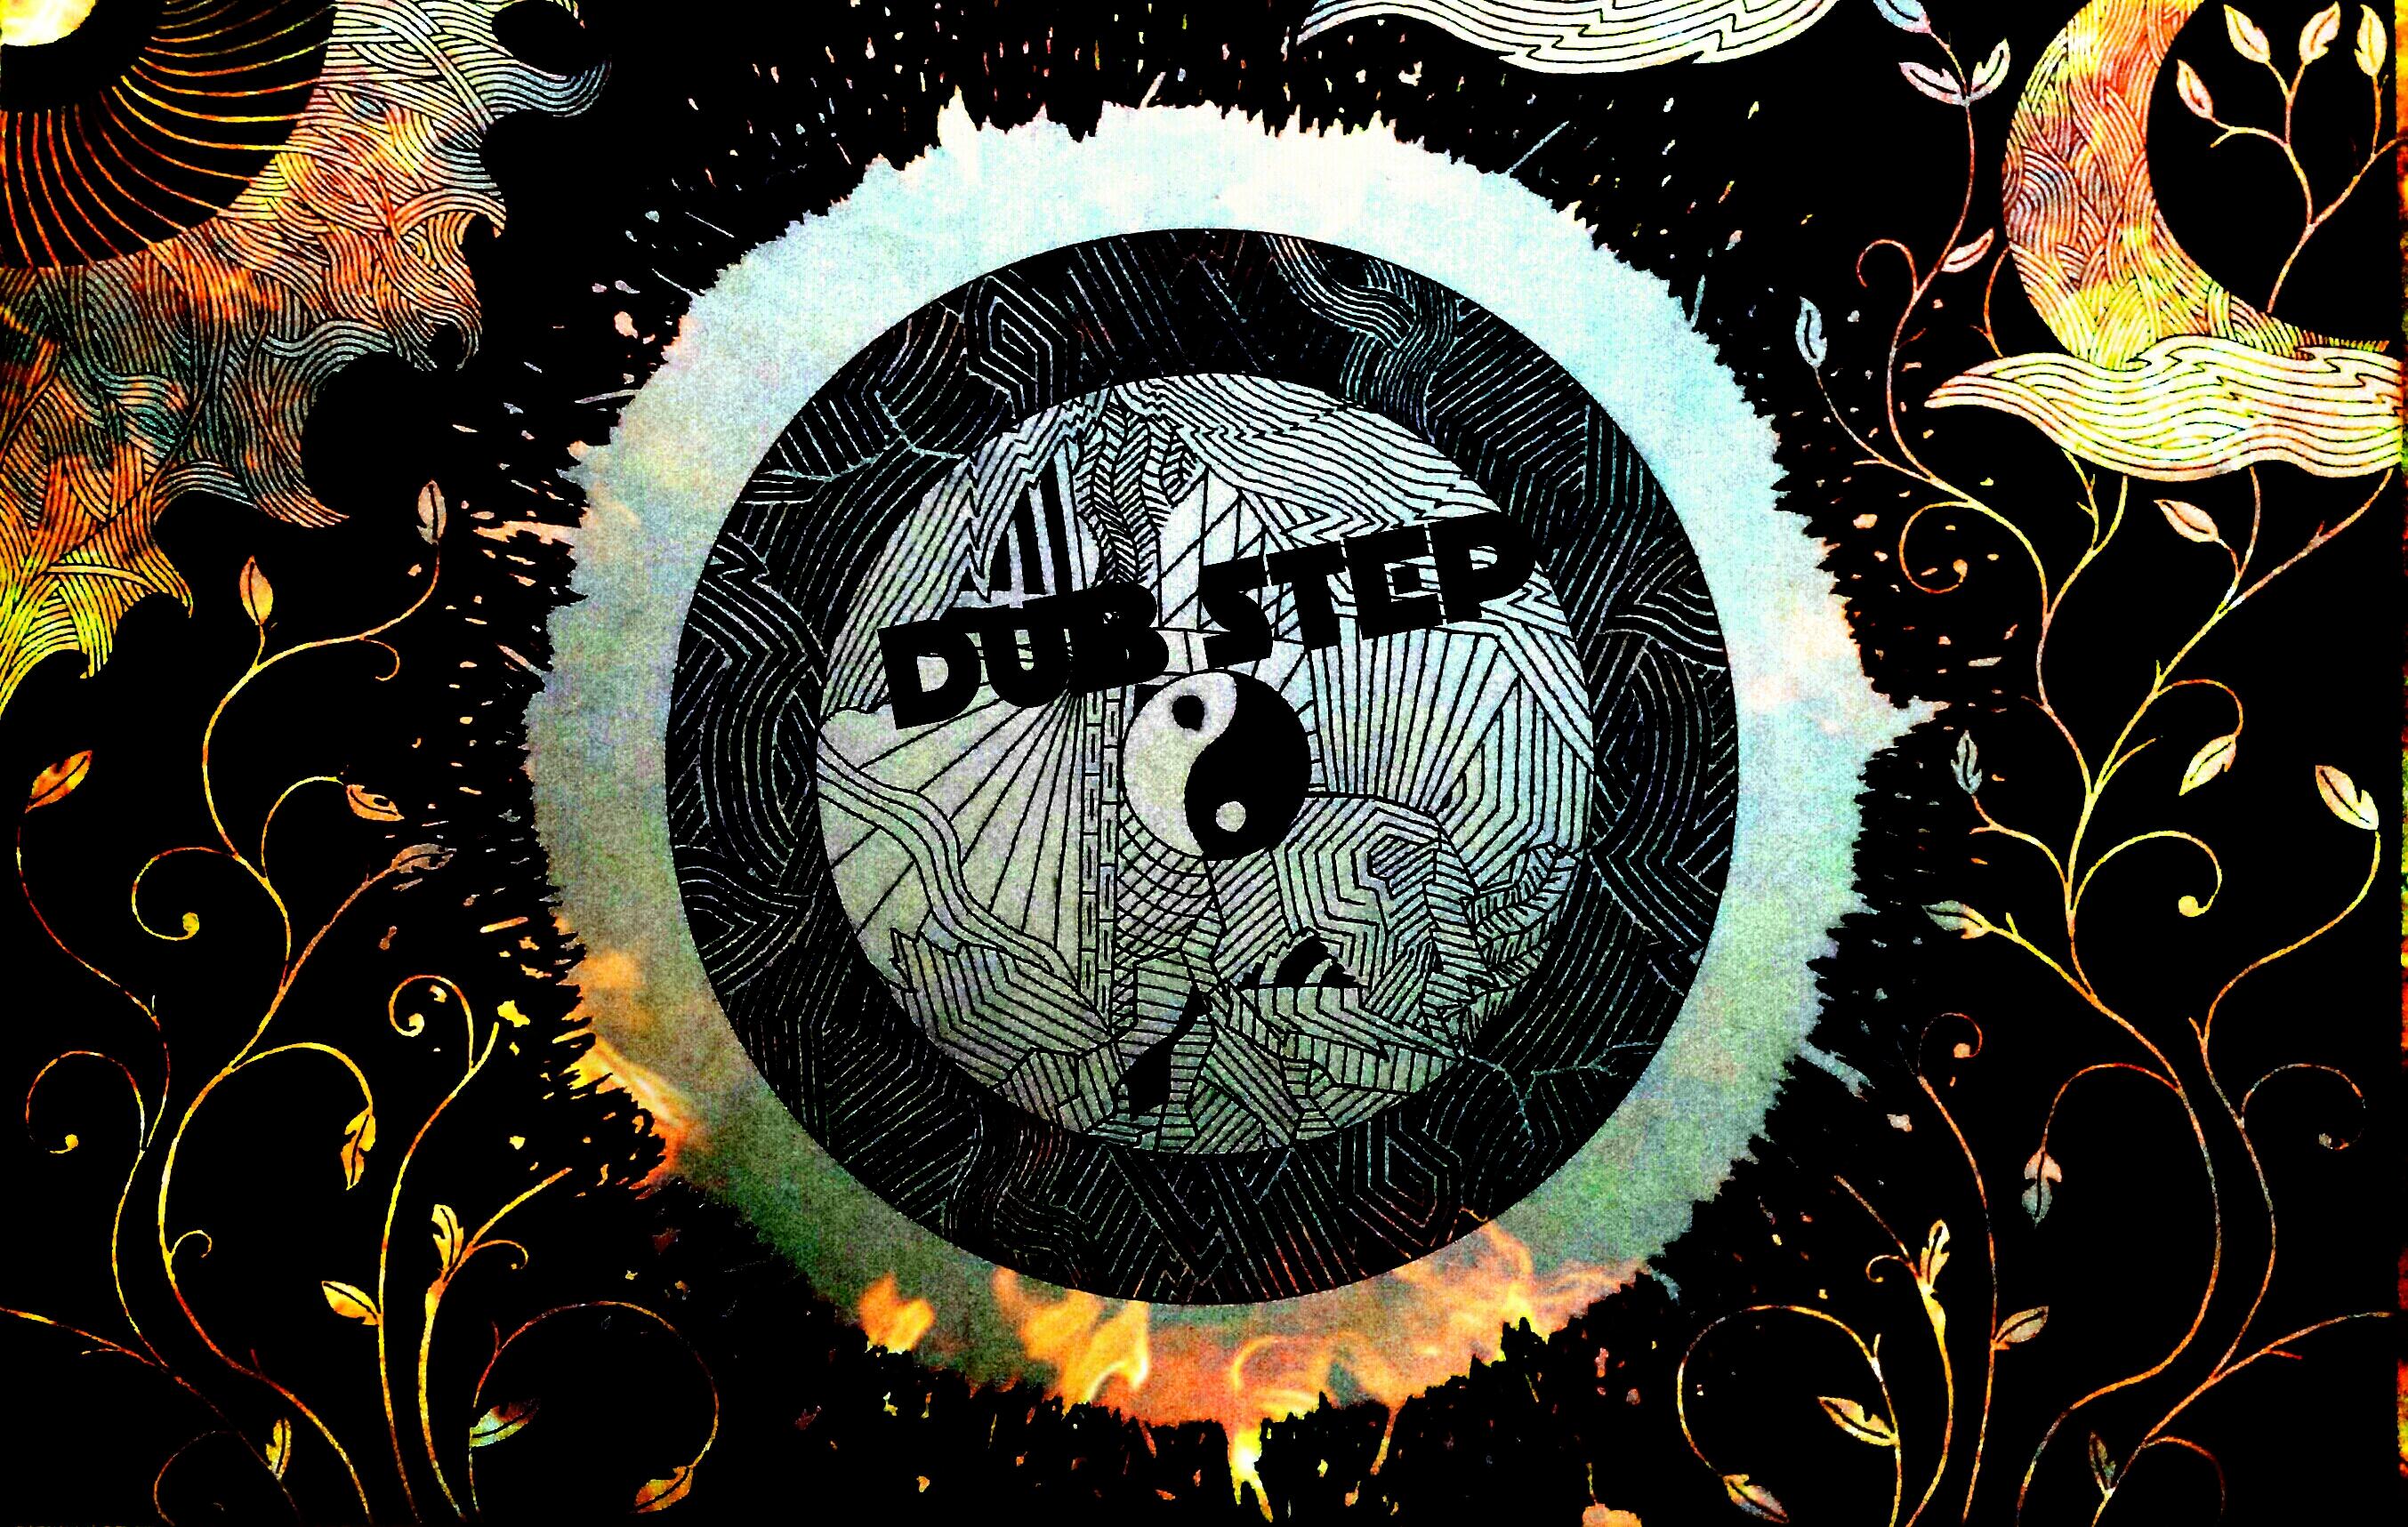 Dubstep Abstract Art Fire | zsny43 | Foundmyself